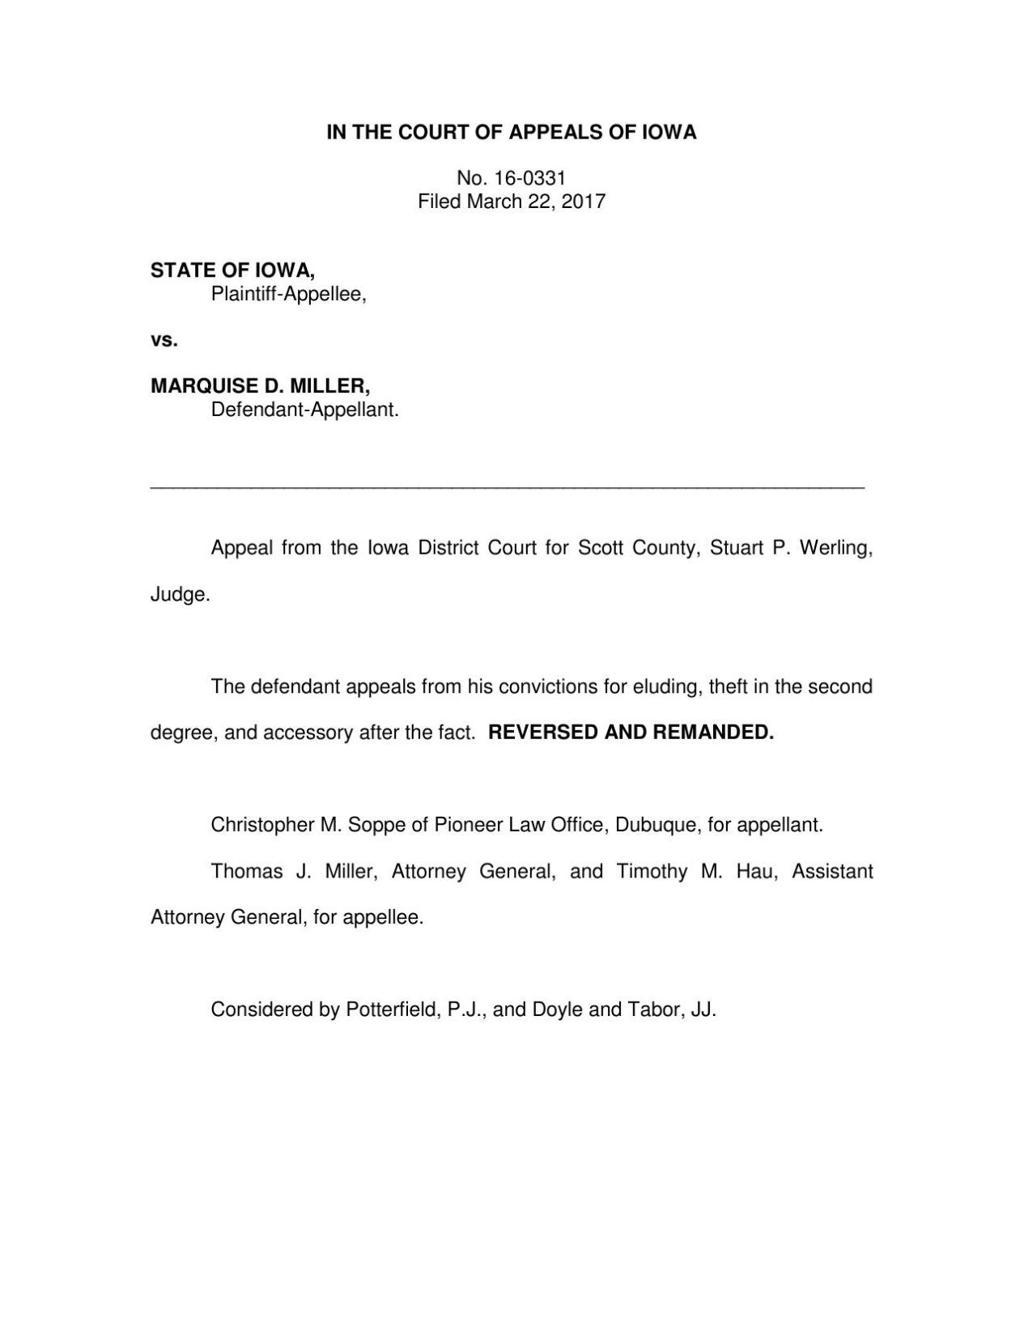 Iowa Court of Appeals tosses Davenport man's conviction